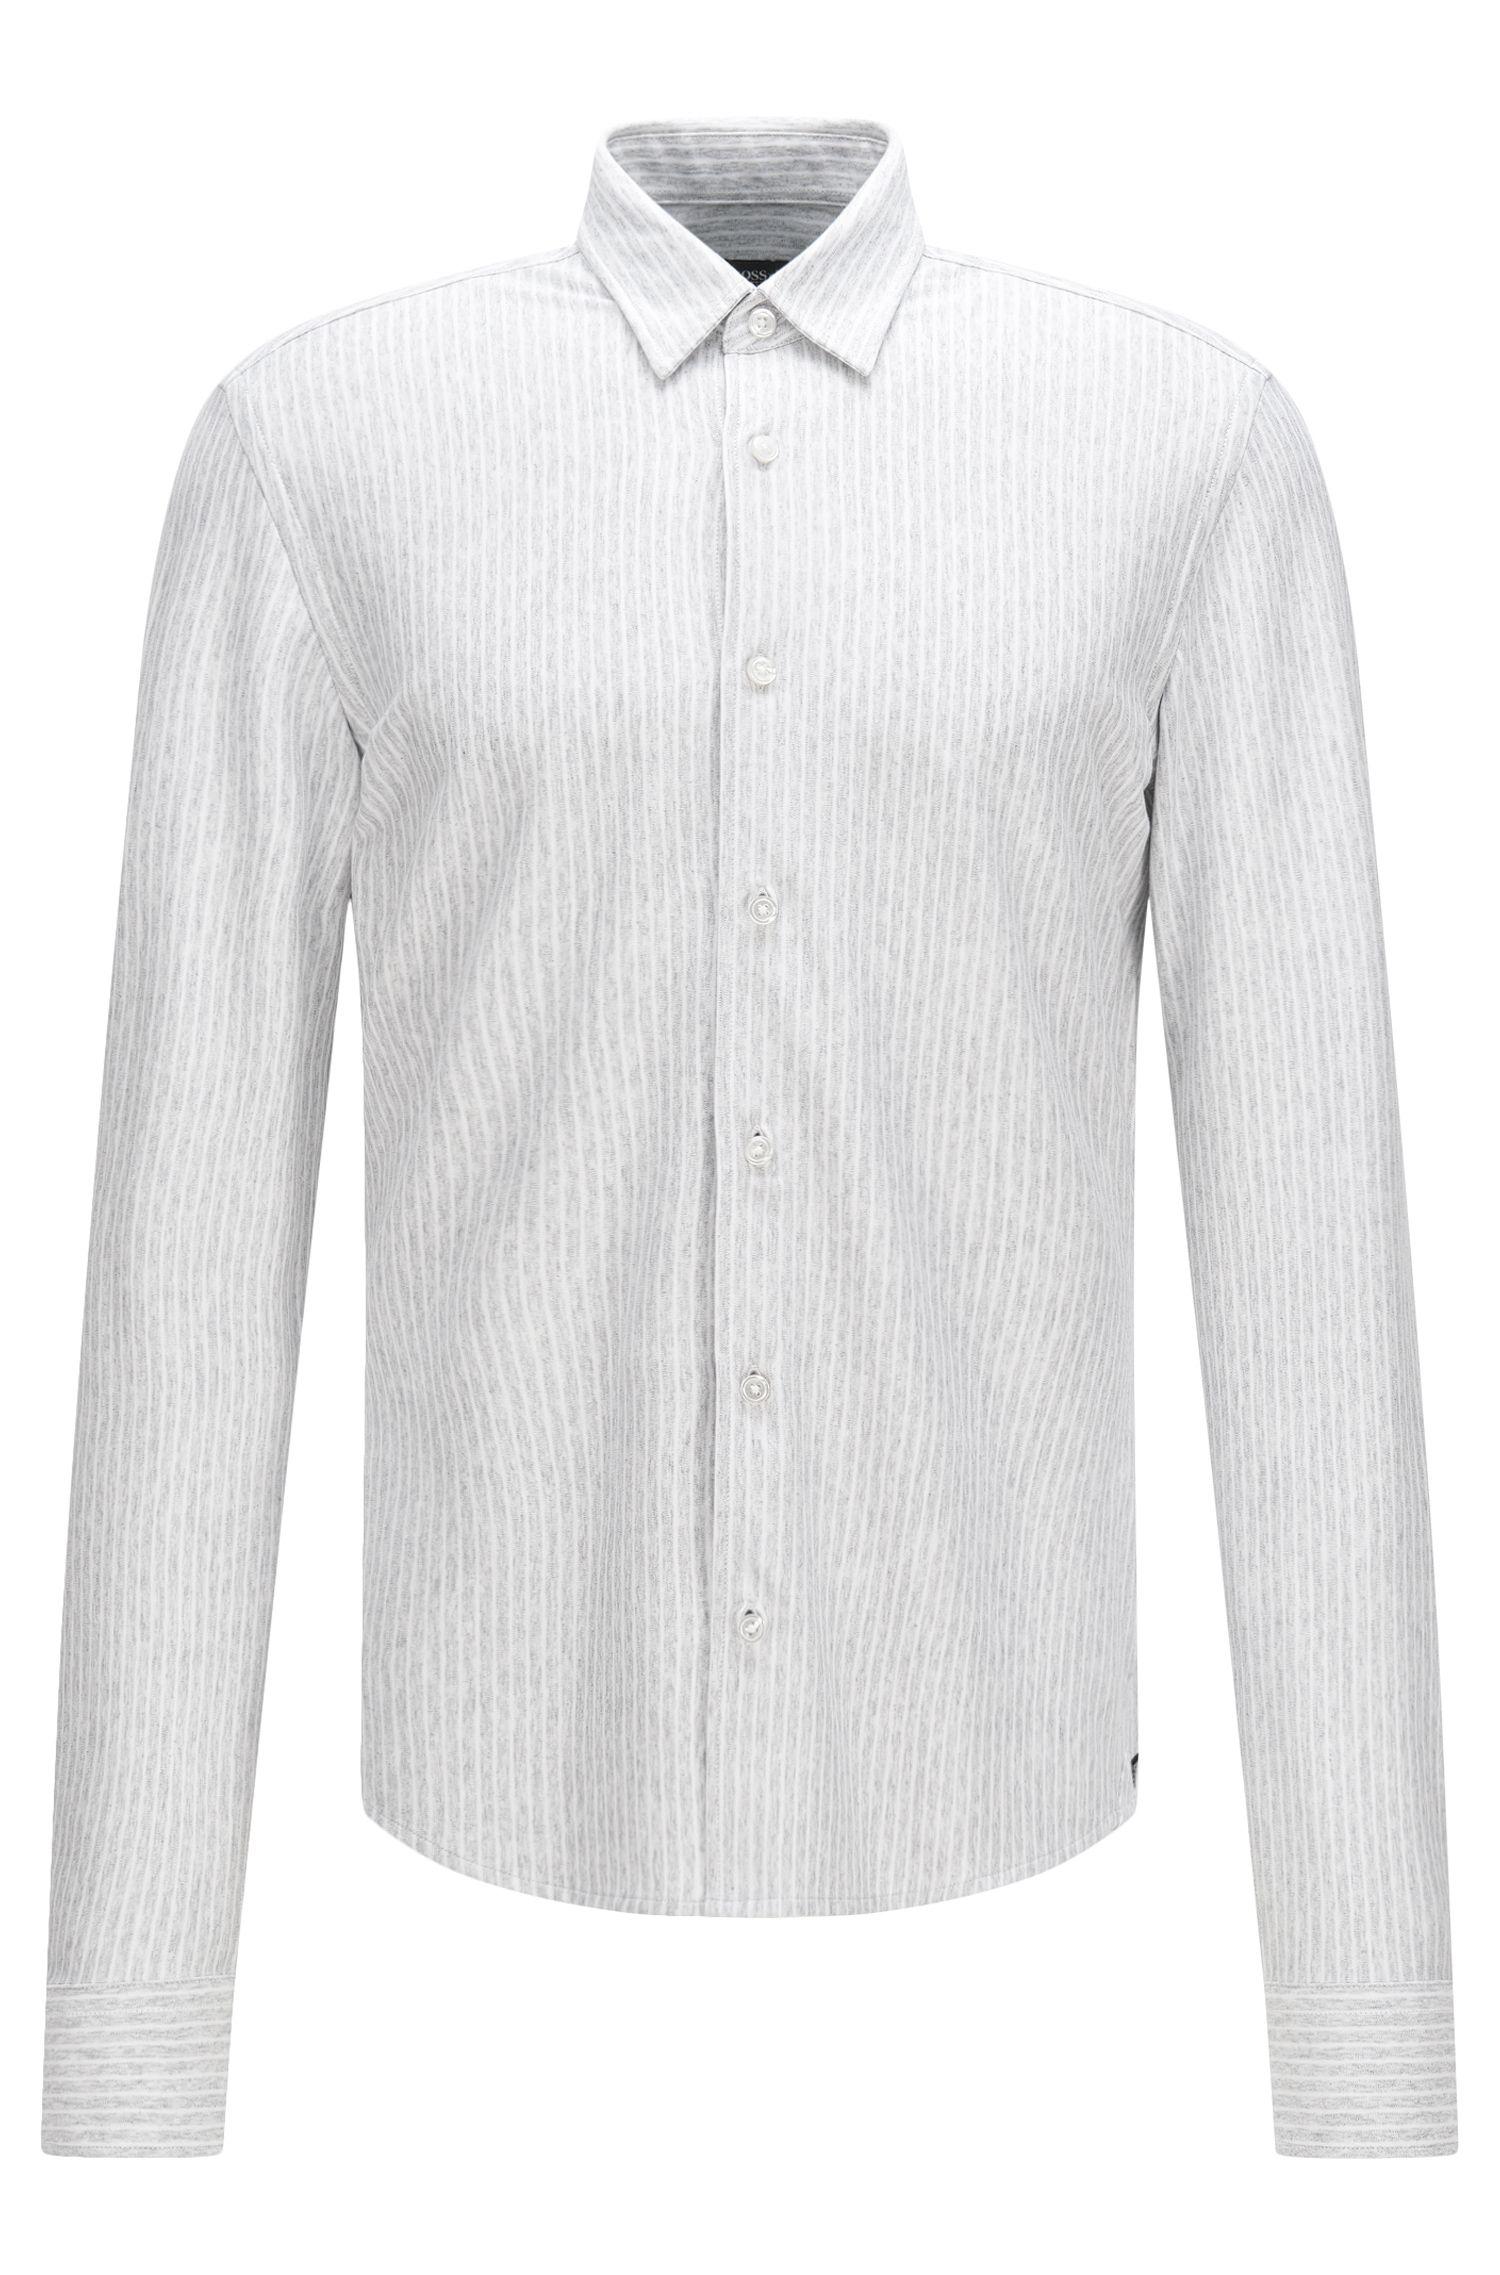 'Reid F'   Slim Fit, Cotton Jersey Button Down Shirt